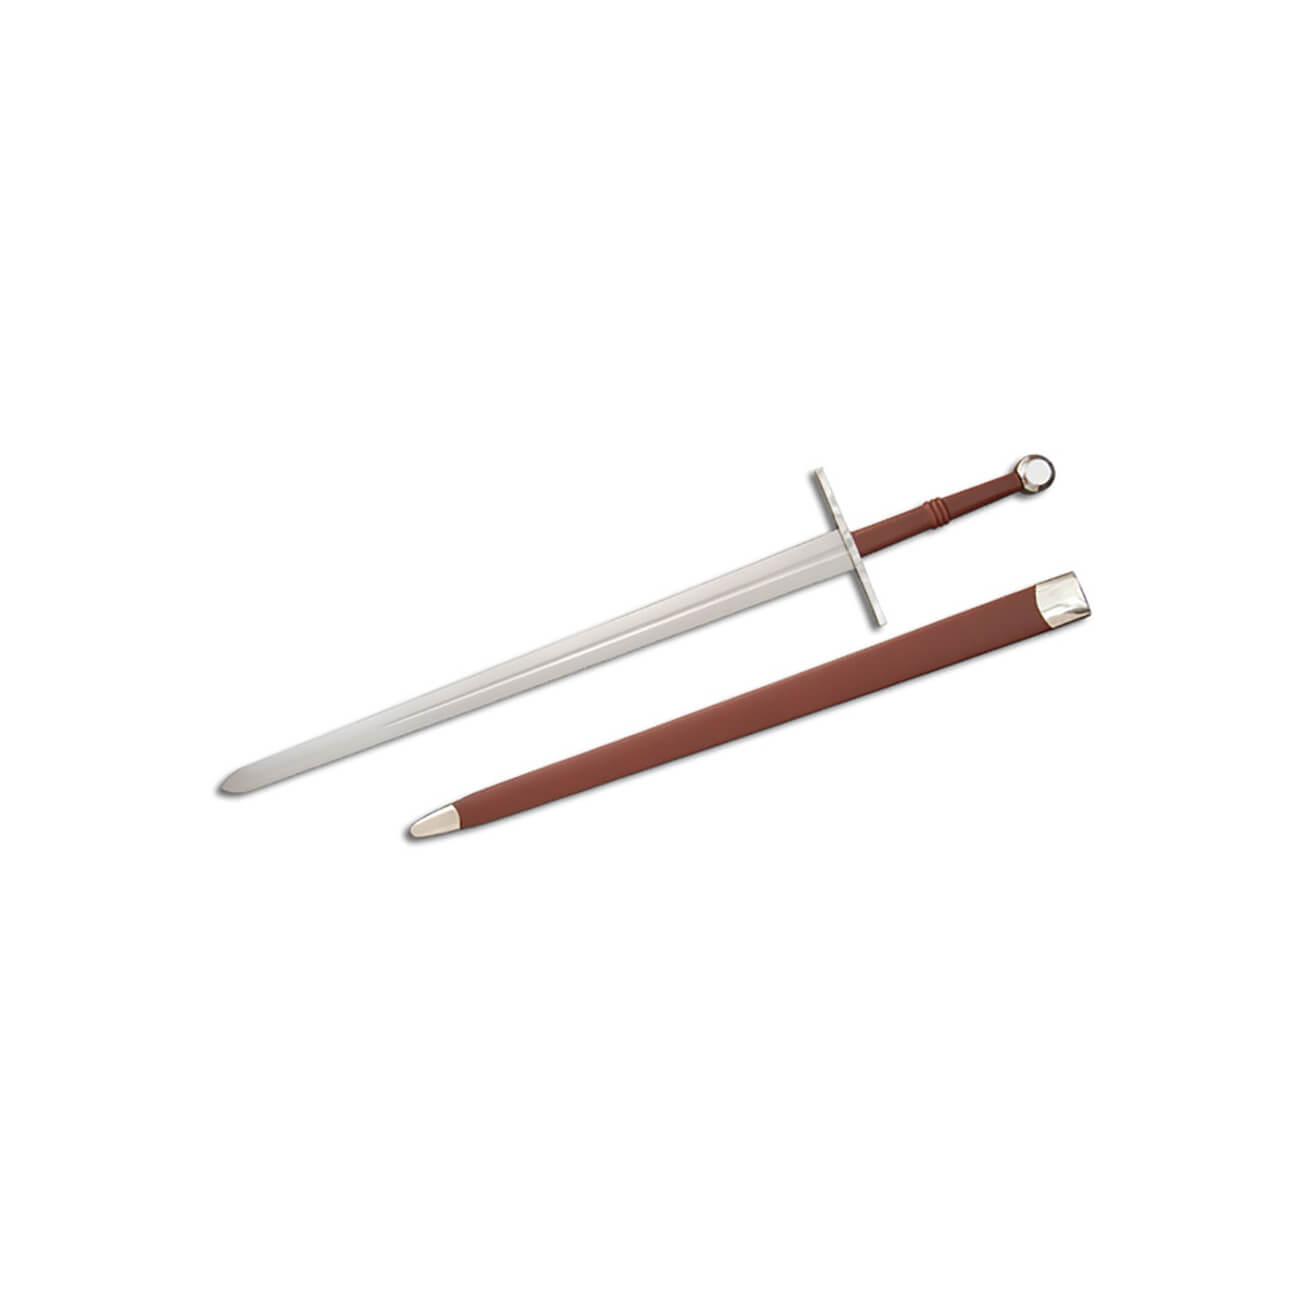 Tinker Great Sword of War SH2424